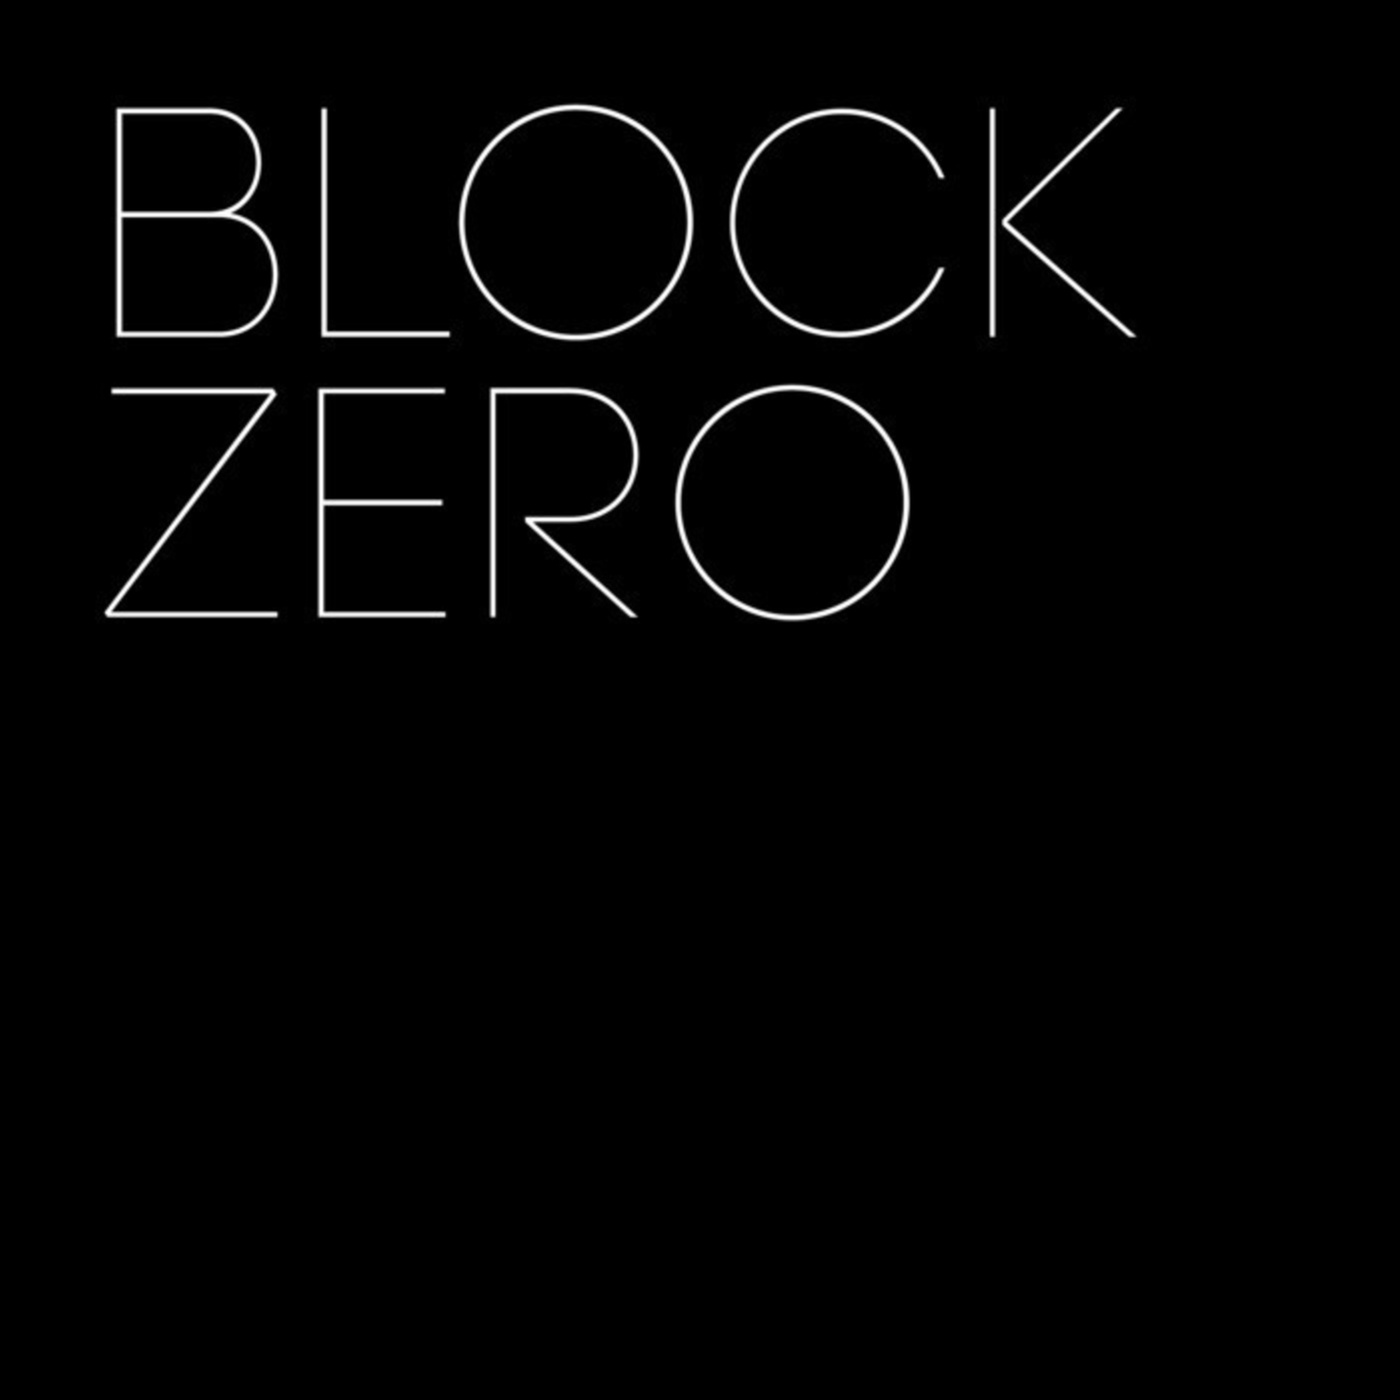 #008 - Solana - The fastest blockchain on earth? Founder Anatoly Yakovenko